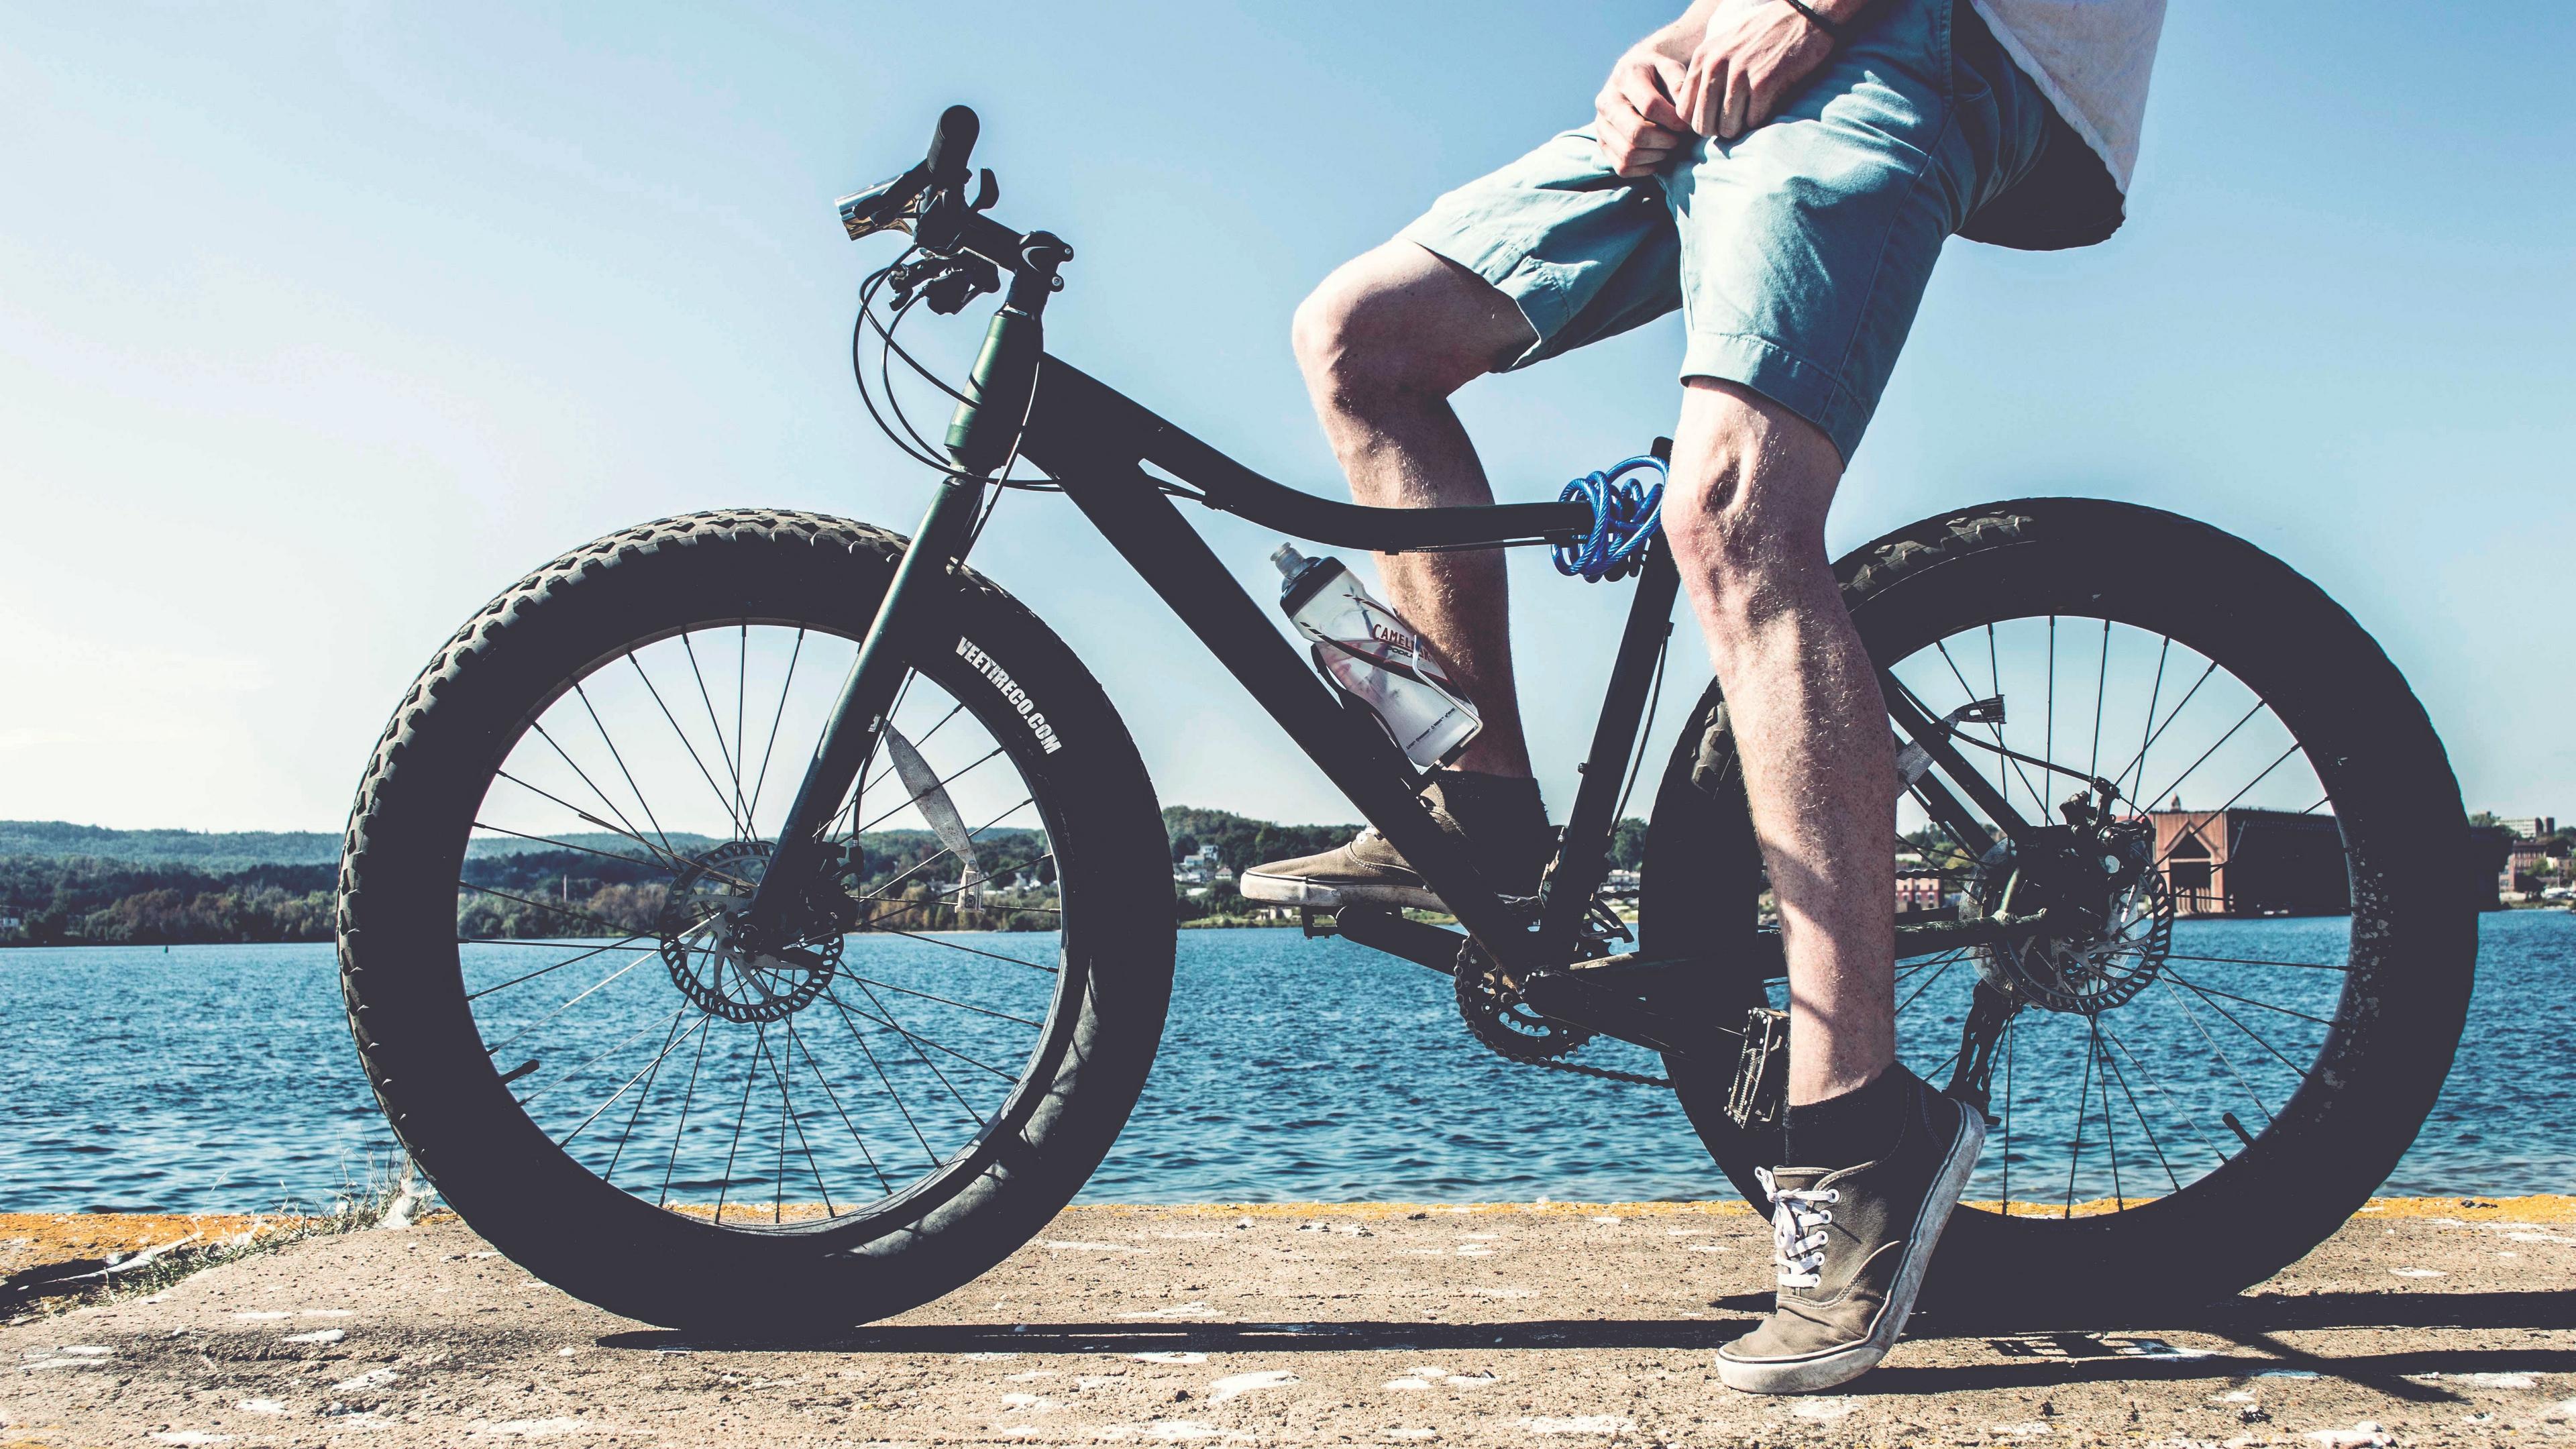 cyclist legs bicycle river 4k 1540062350 - cyclist, legs, bicycle, river 4k - legs, cyclist, Bicycle